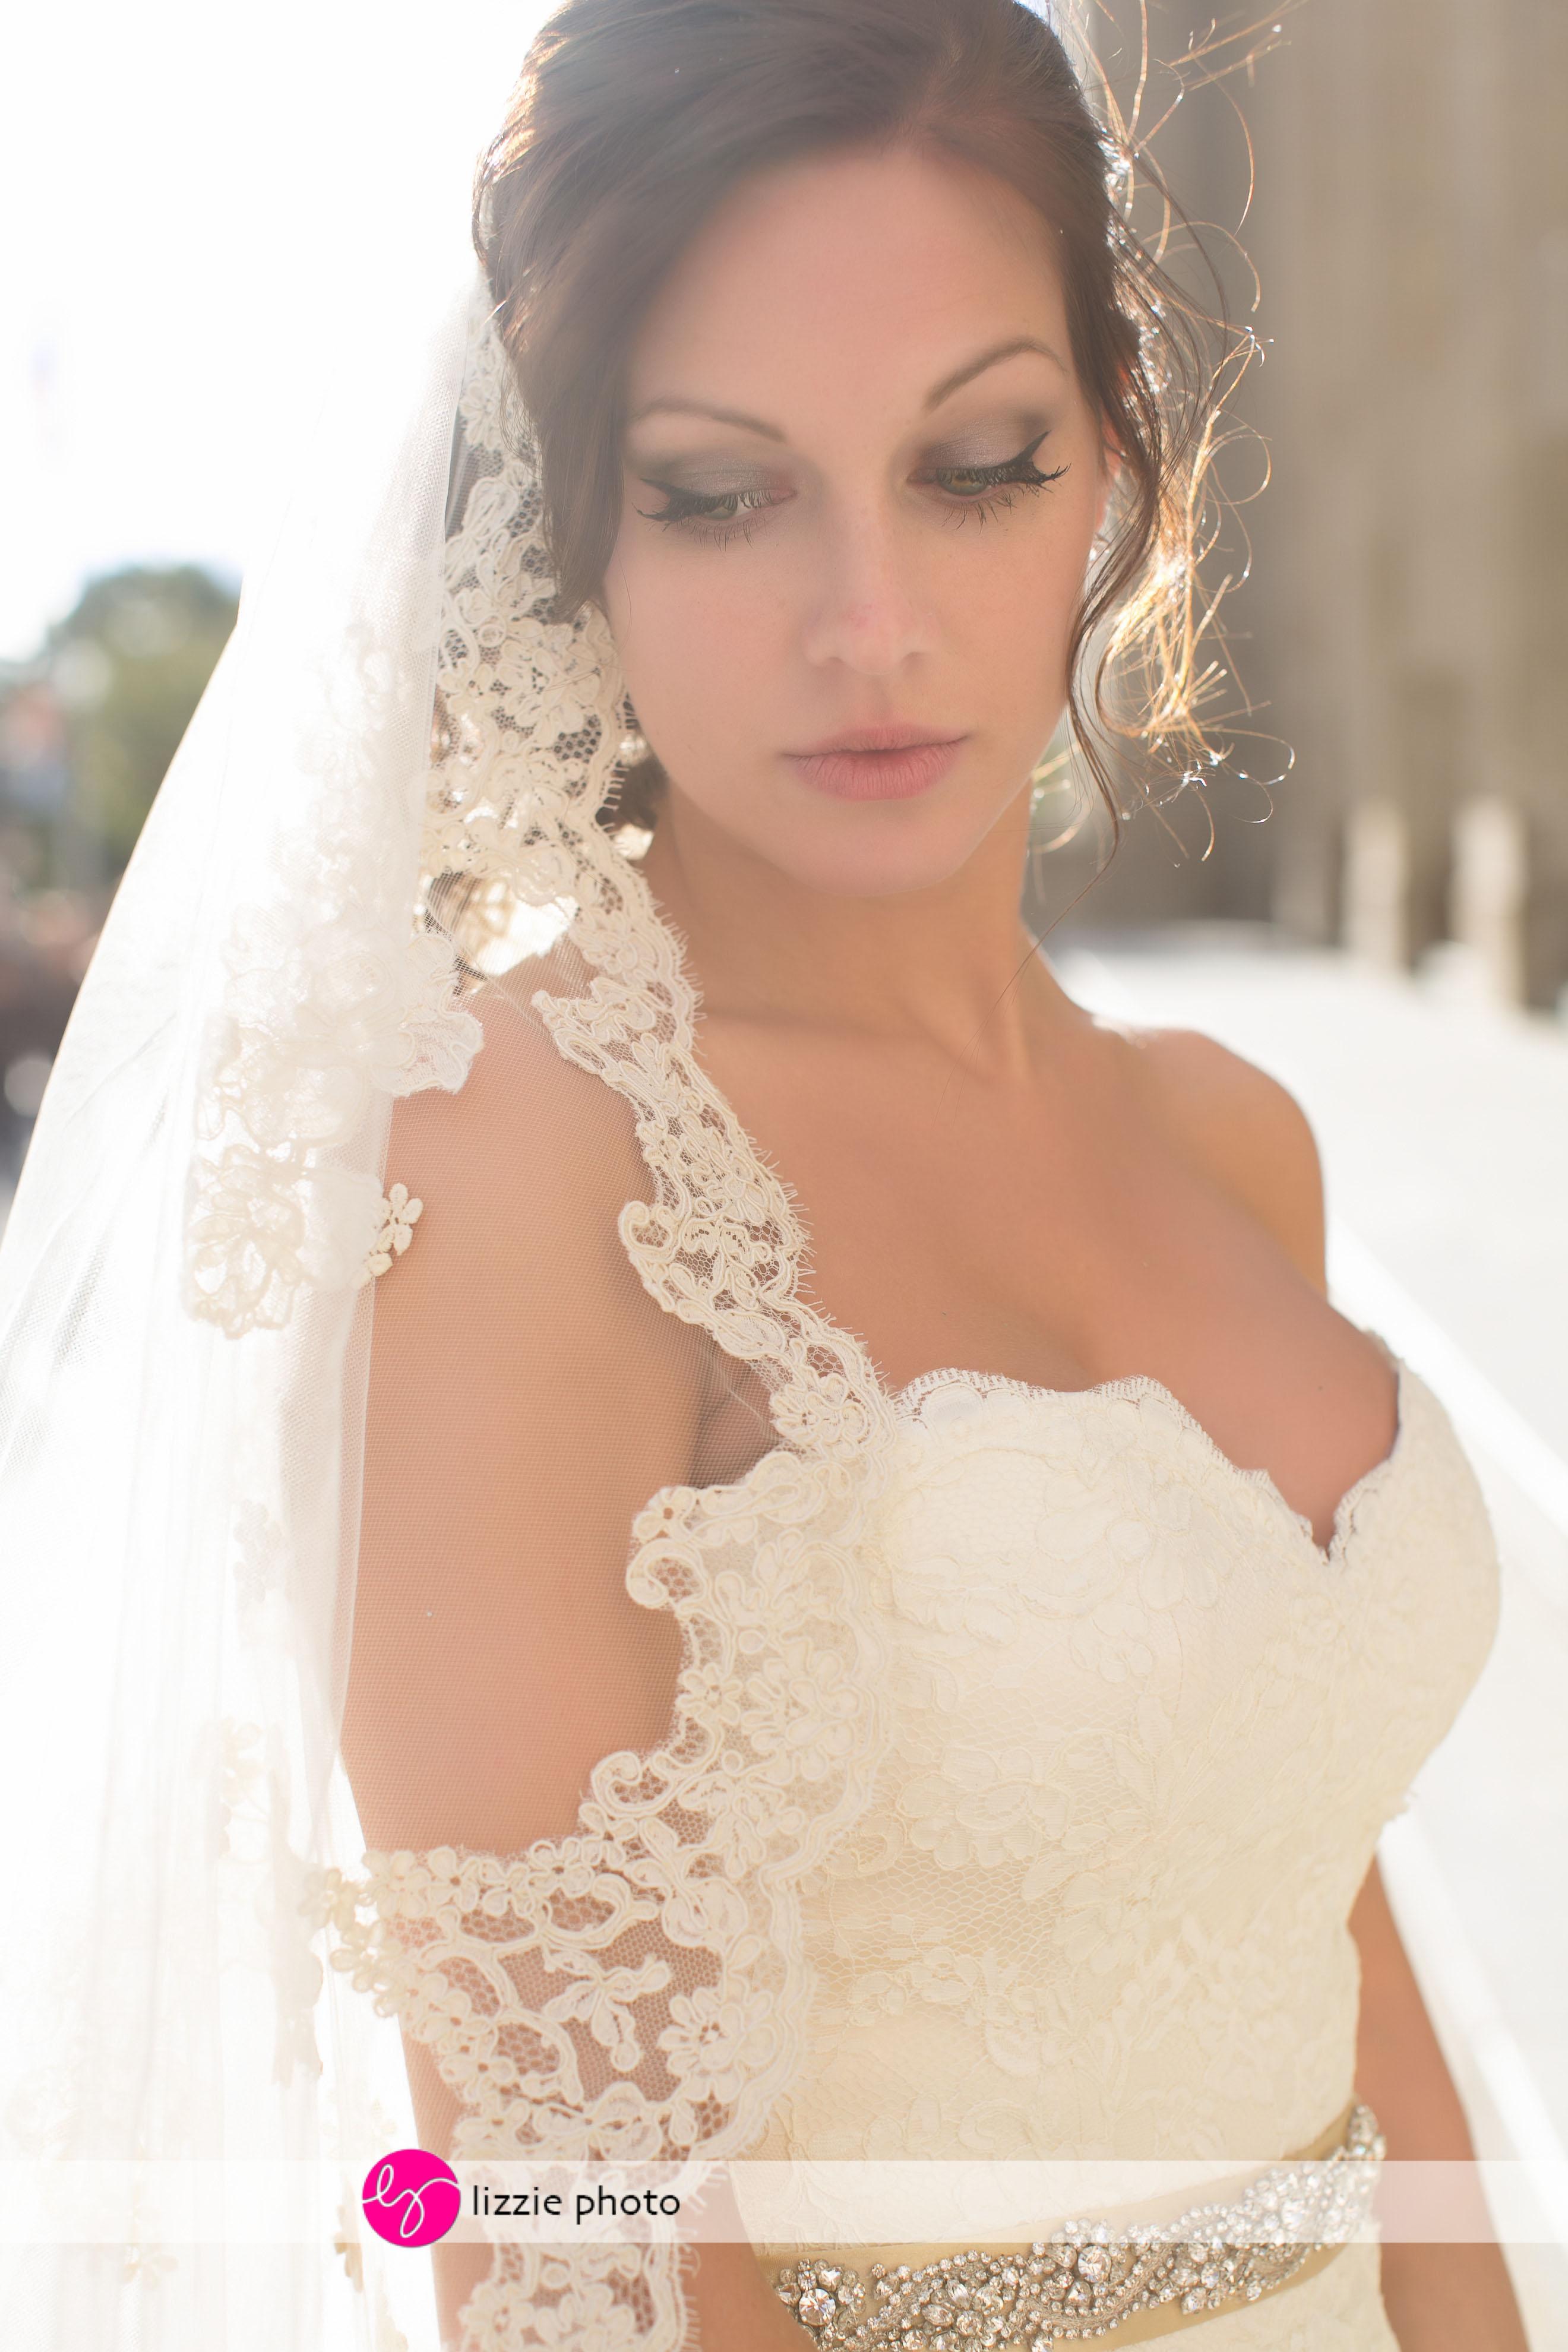 michigan-wedding-photographer-38